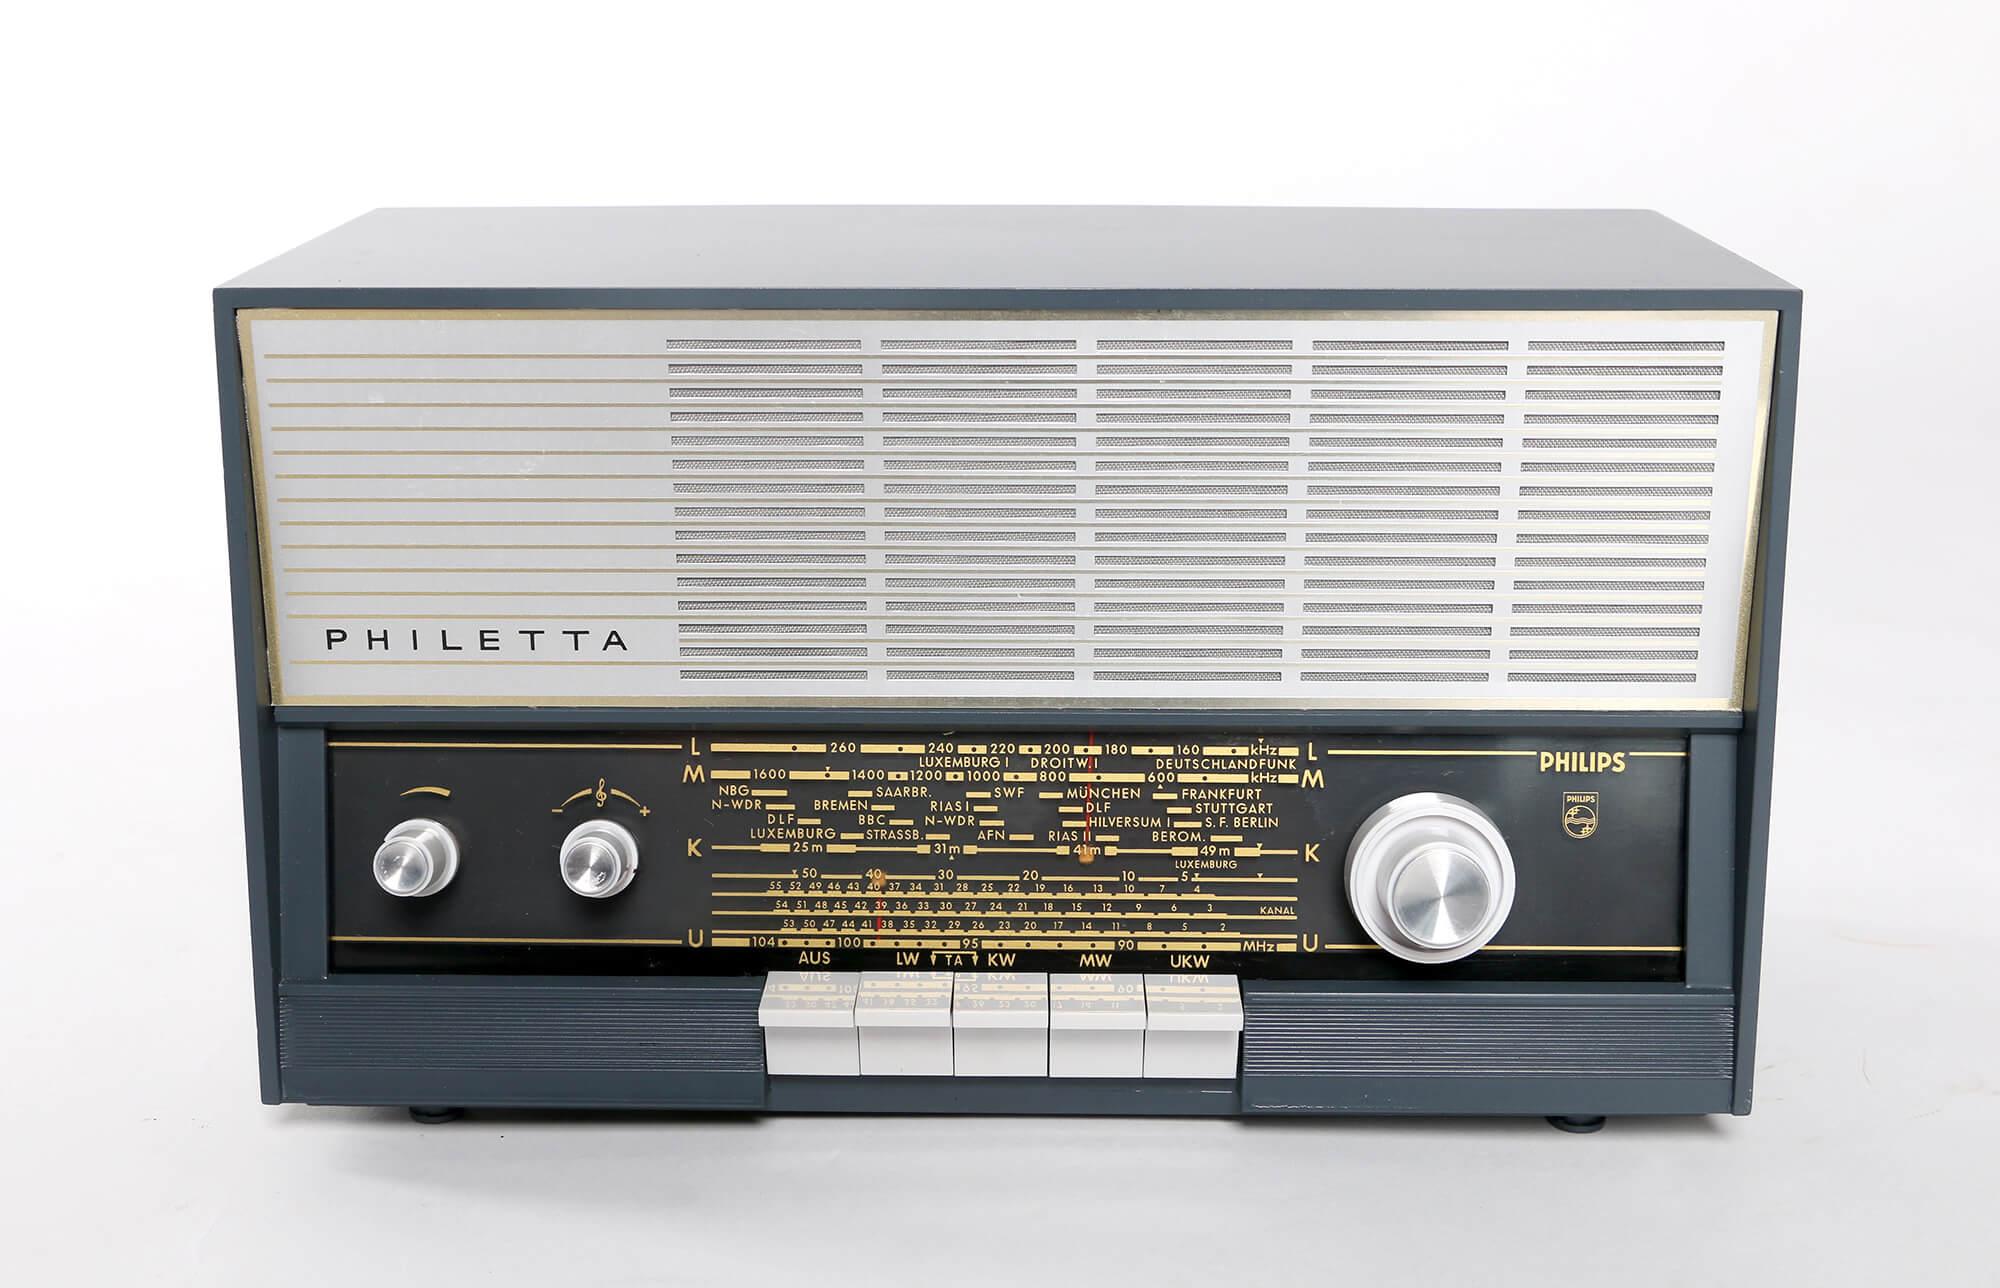 Philips Philetta B2D53A